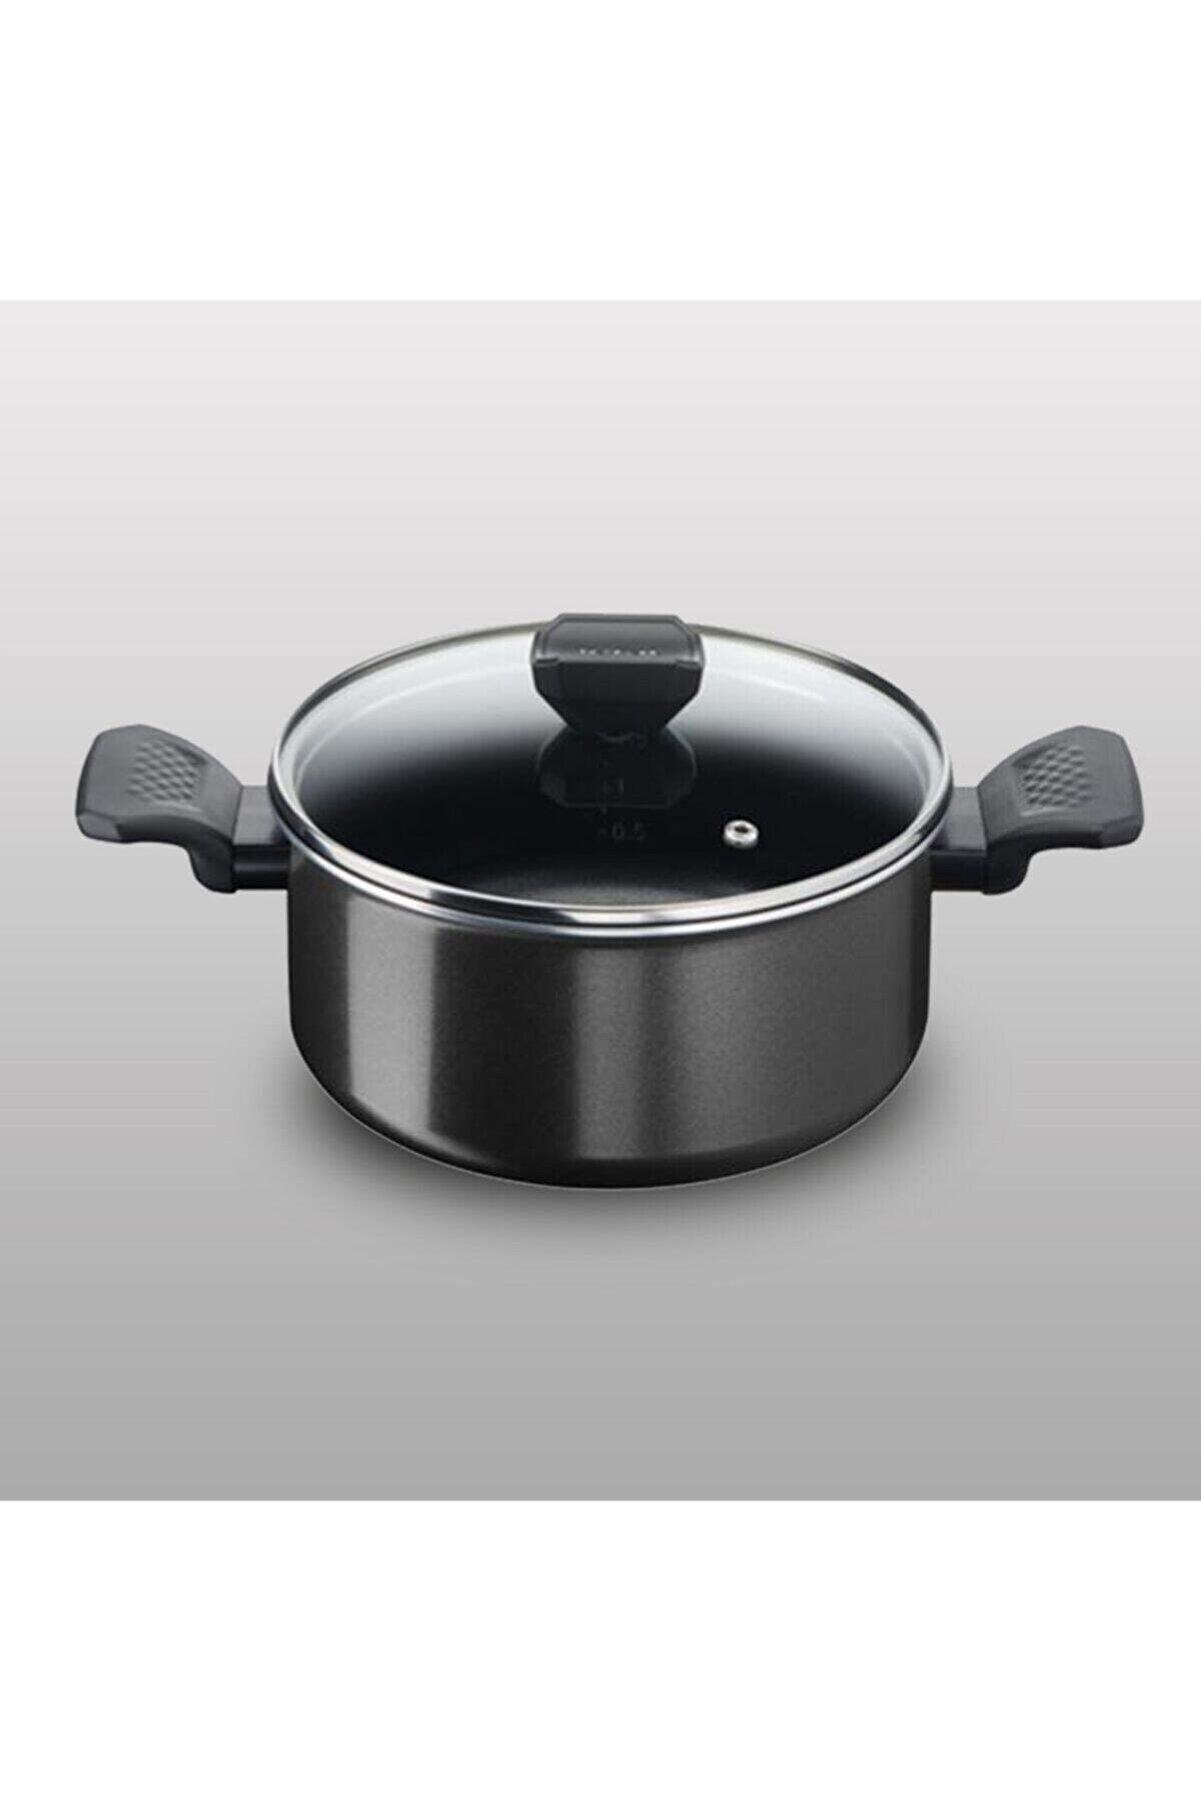 TEFAL Titanyum 1x Extra Cook&clean Difüzyon Tabanlı Derin Tencere - 24 Cm